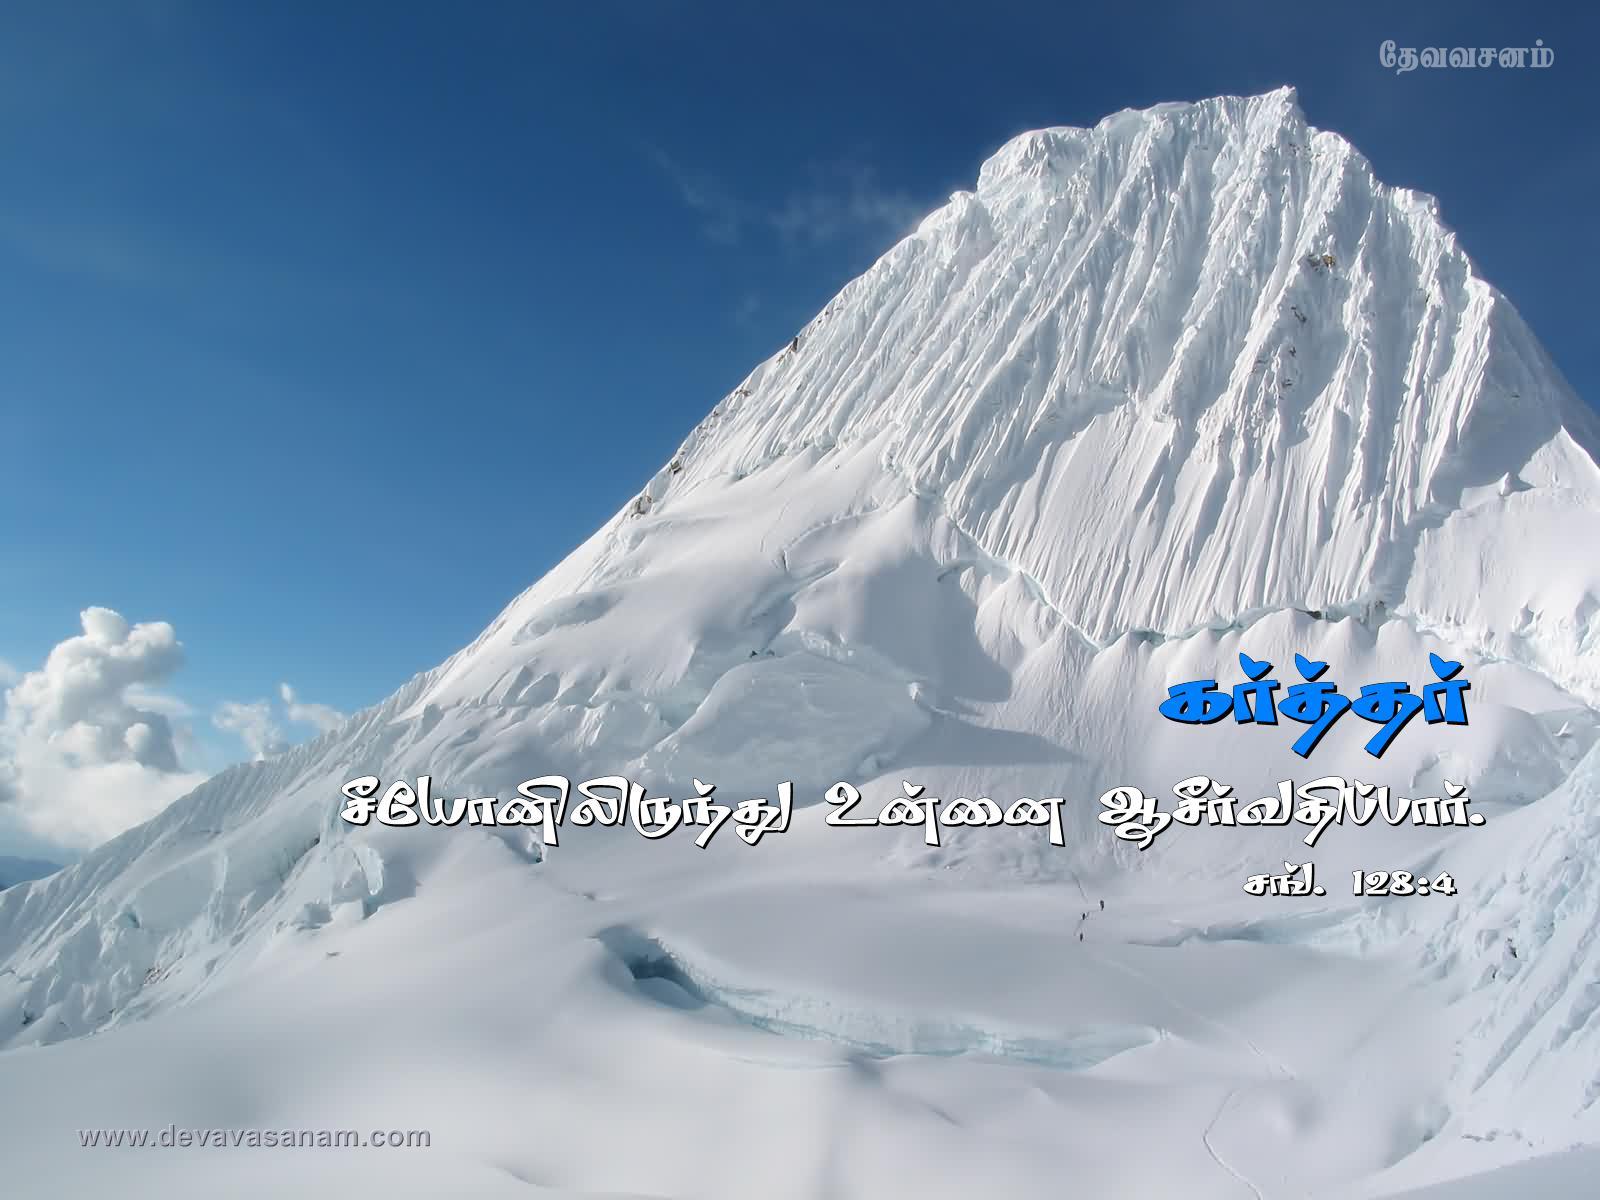 http://1.bp.blogspot.com/--PeqLMfE25Y/TzKfLrzyILI/AAAAAAAABlE/JkY3ena8WiI/s1600/tamil+bible+blessing+bible+verse+desktop+wallpapers.jpg